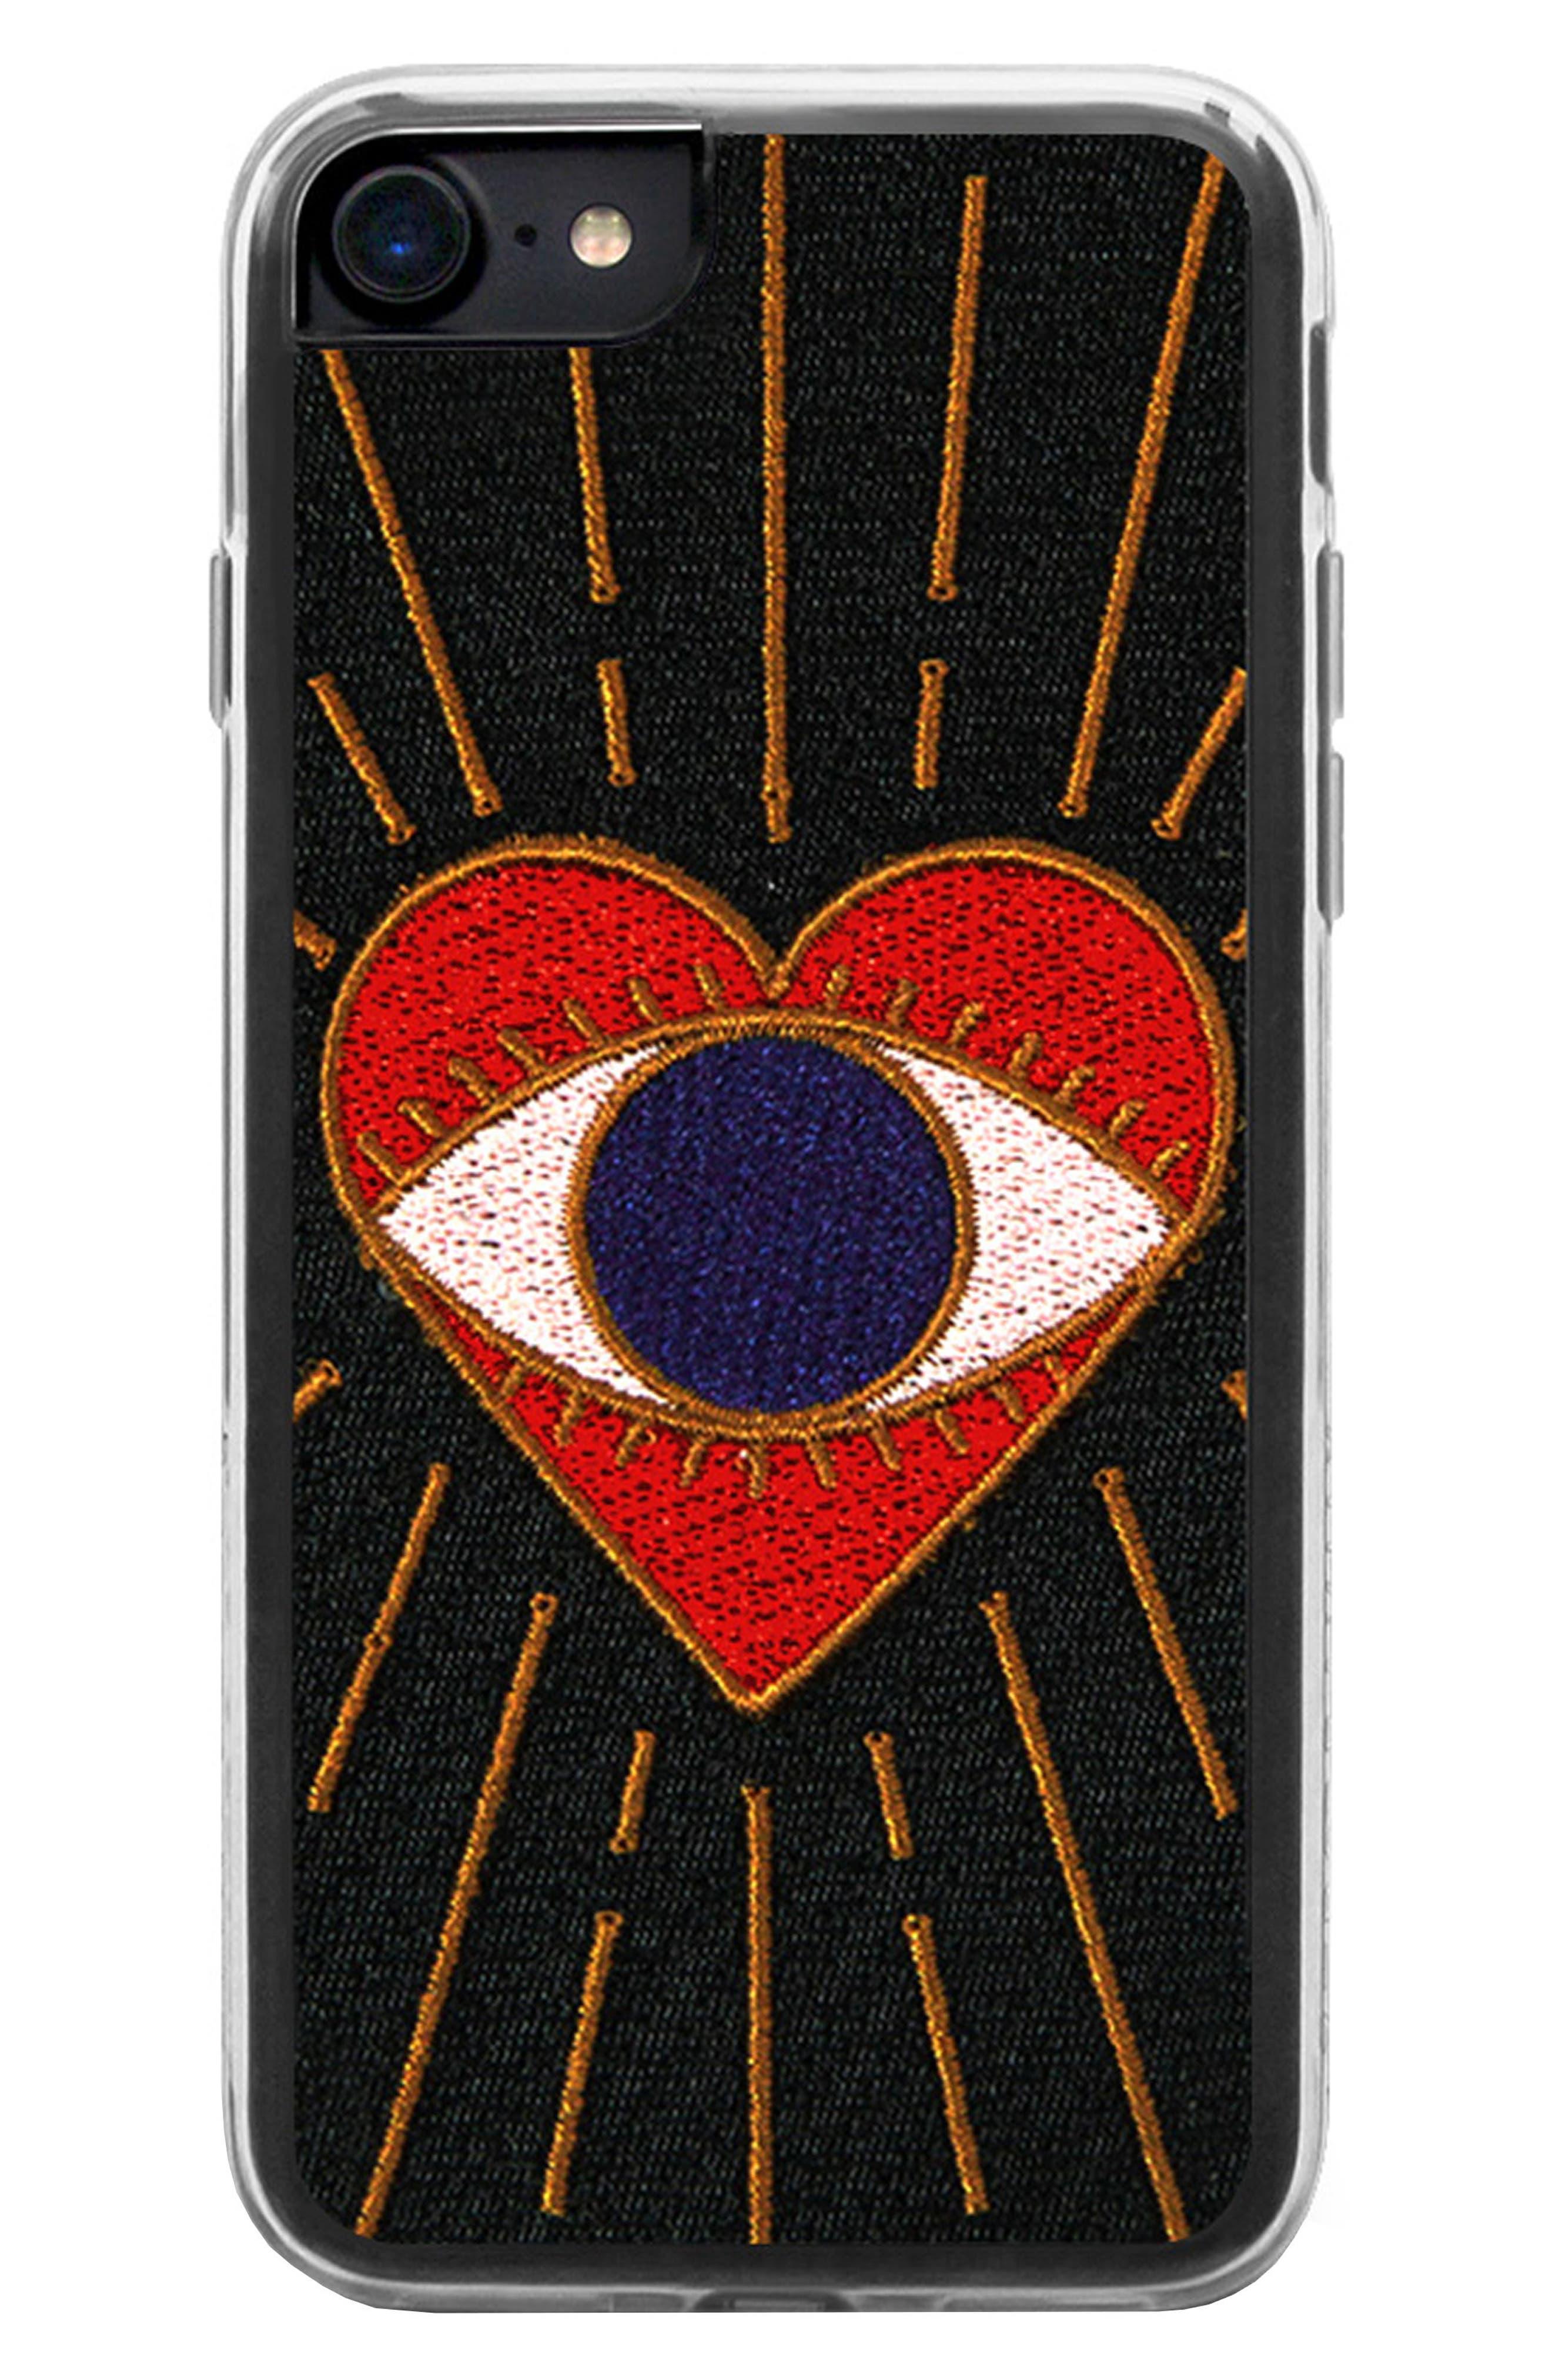 Visio iPhone 7 & 7 Plus Case,                             Main thumbnail 1, color,                             001